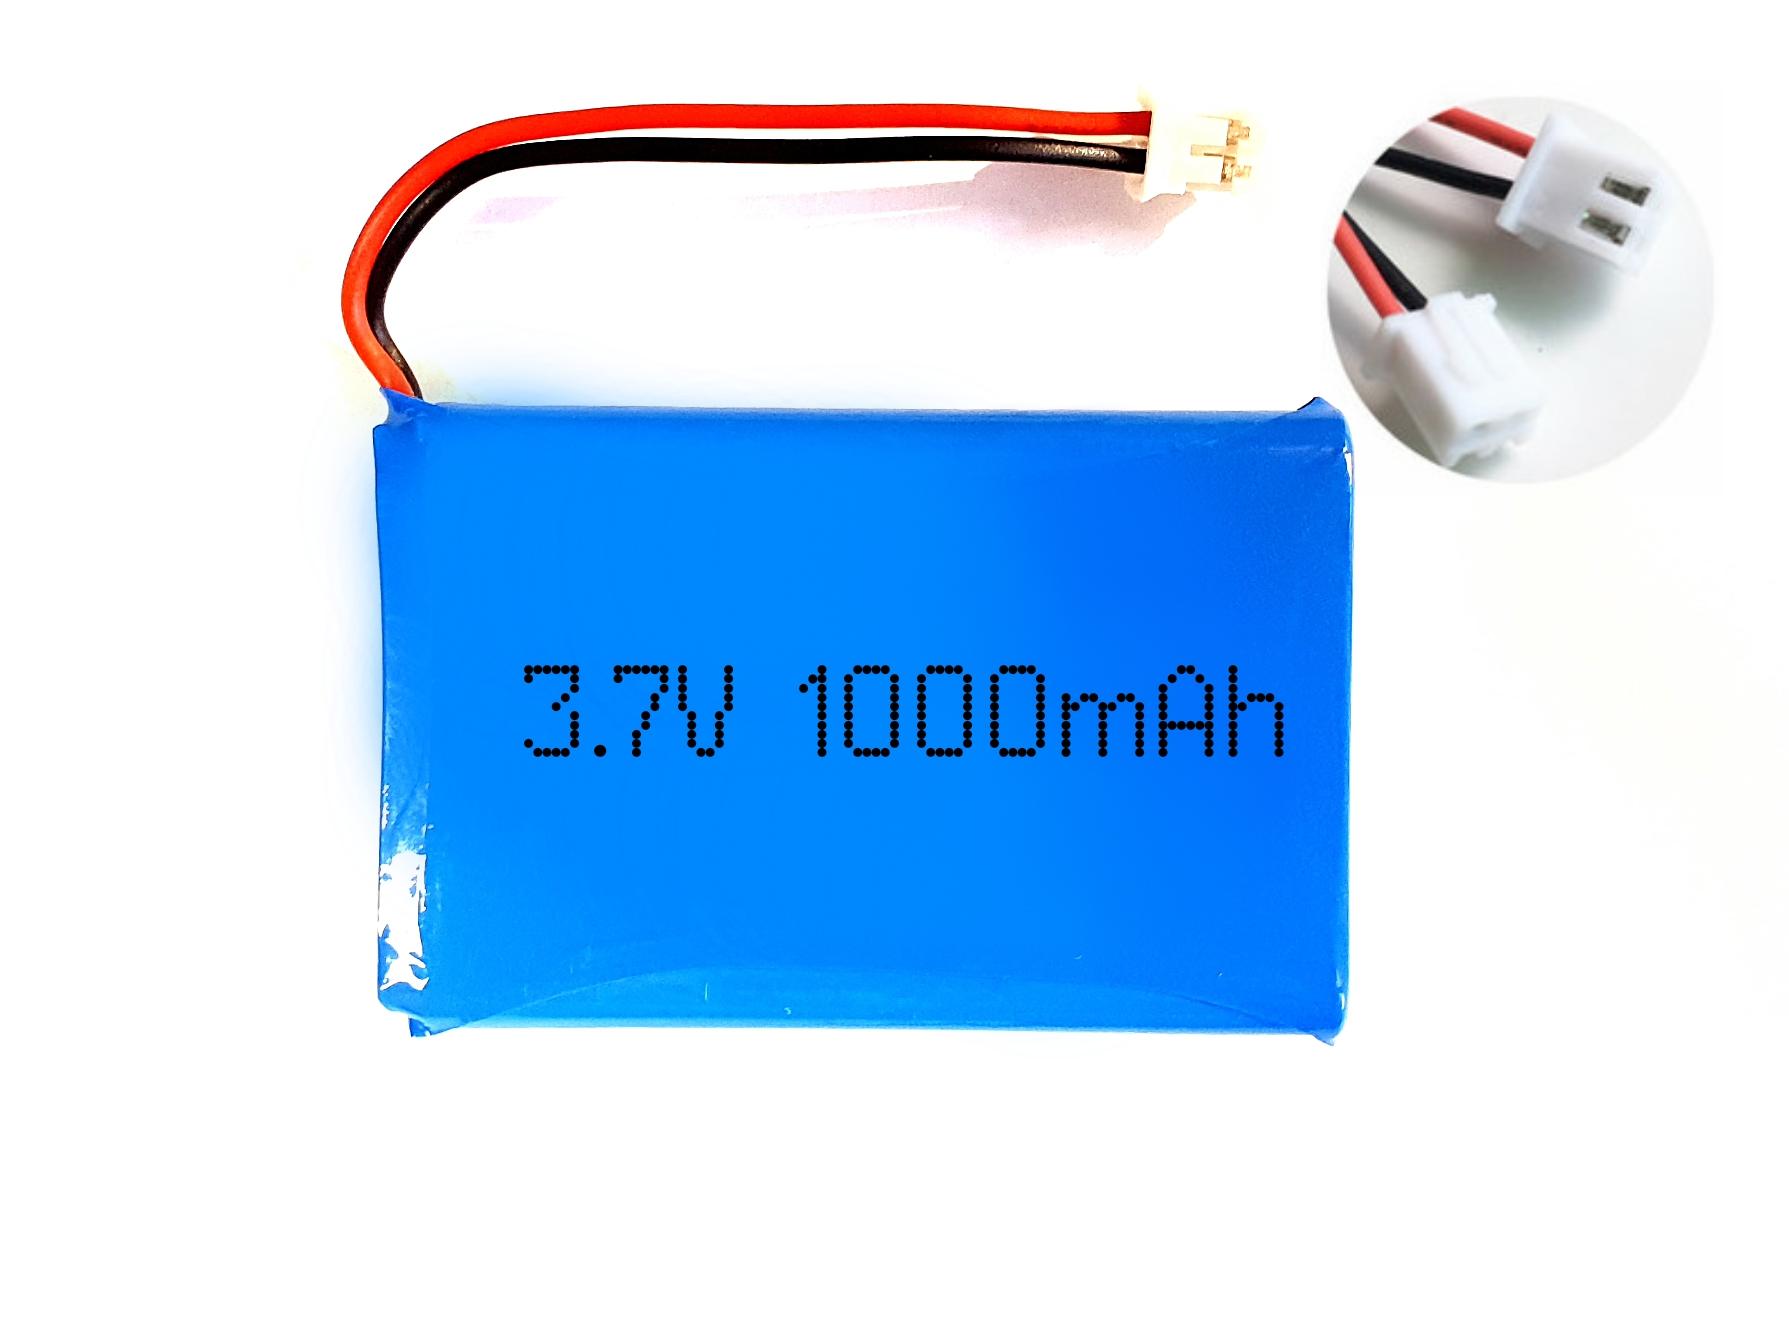 Batería de Respaldo para Alarma G90 Plus 1000mAh/3.7V